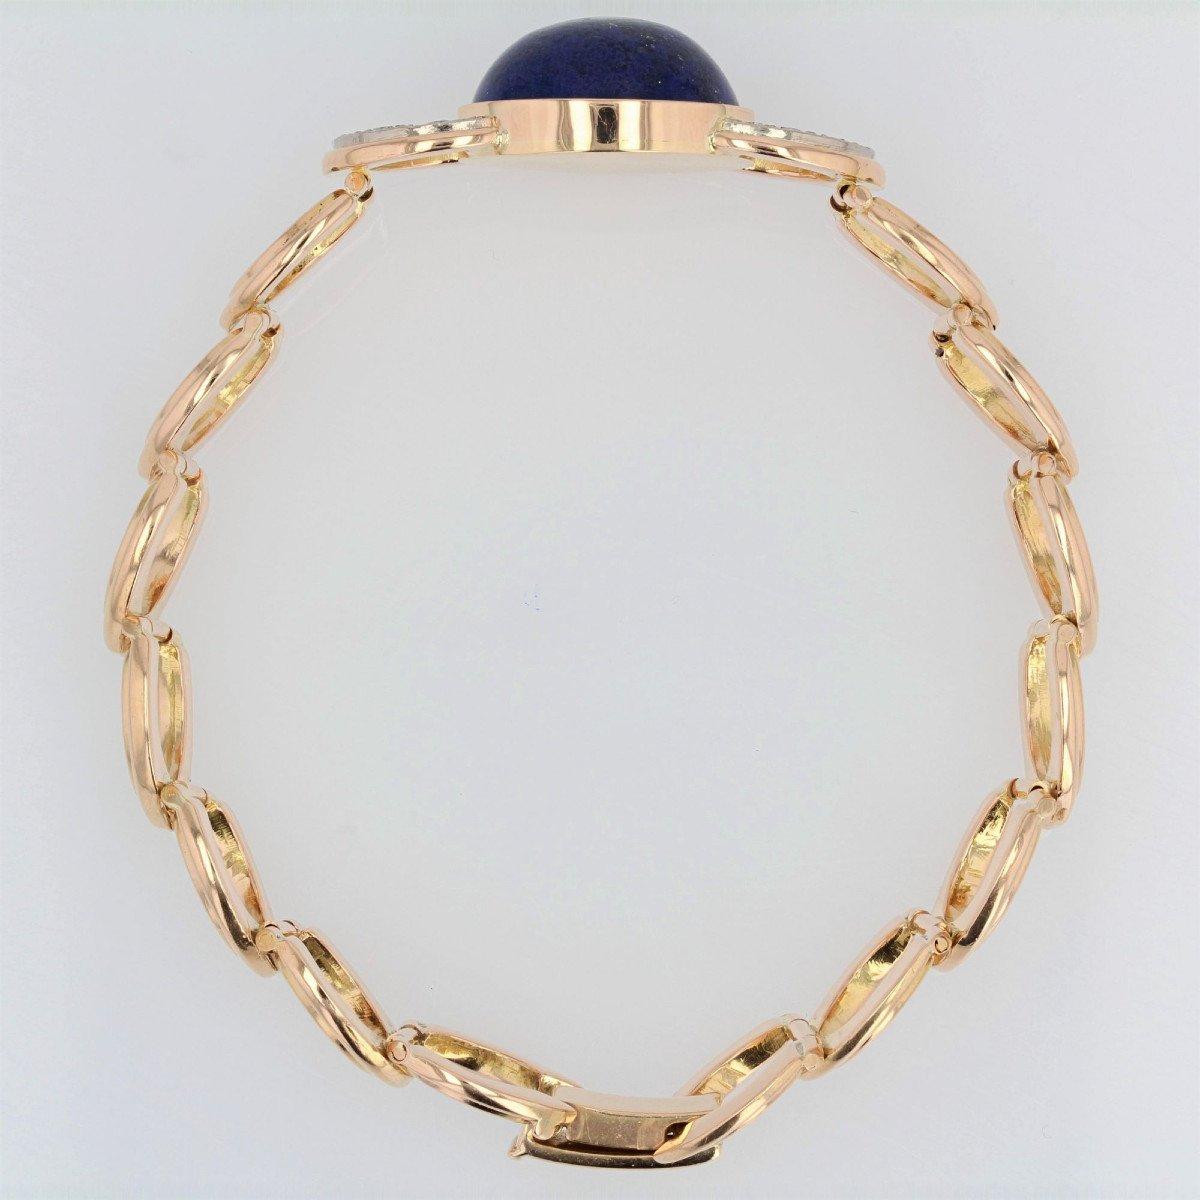 Gold Bracelet With Diamonds And Its Lapis Lazuli Cabochon-photo-5